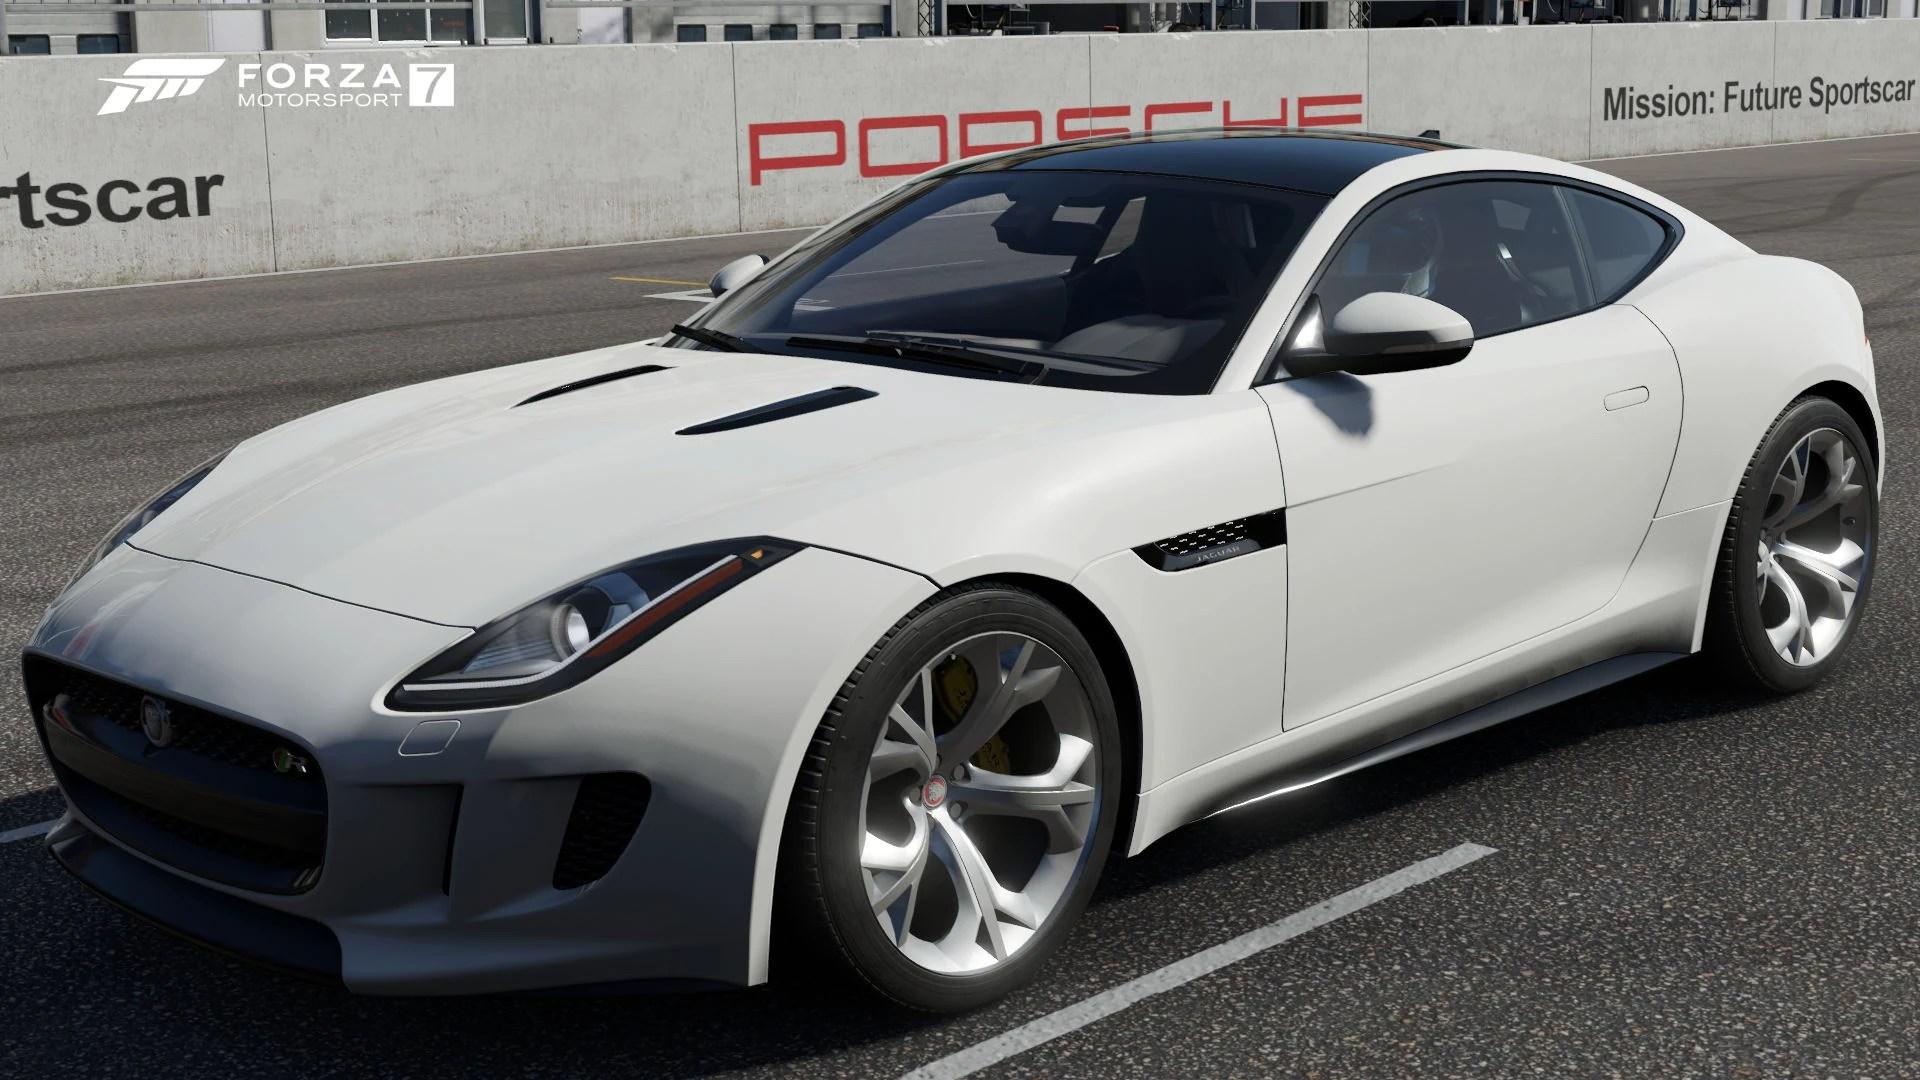 medium resolution of 2015 jaguar f type r coup in forza motorsport 7